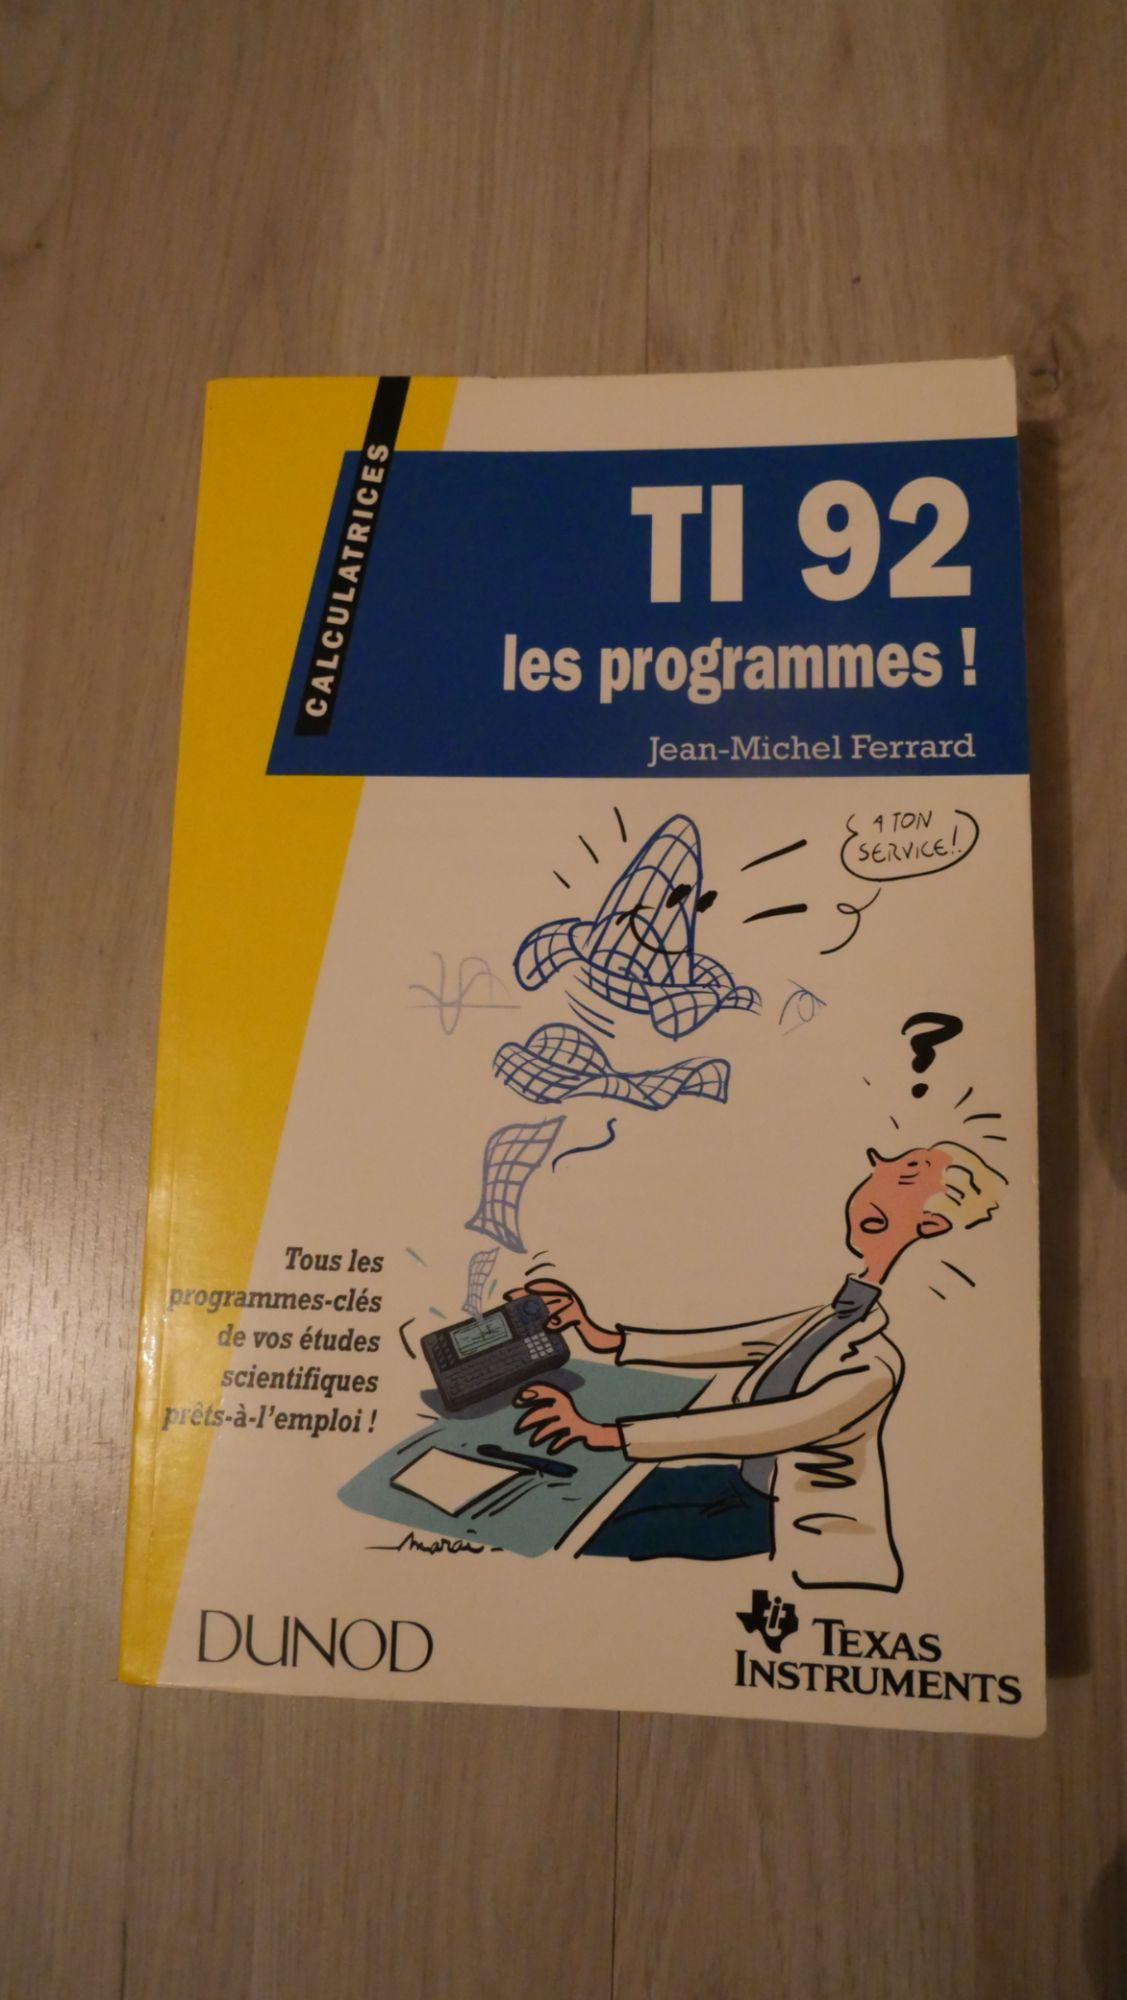 TI 92